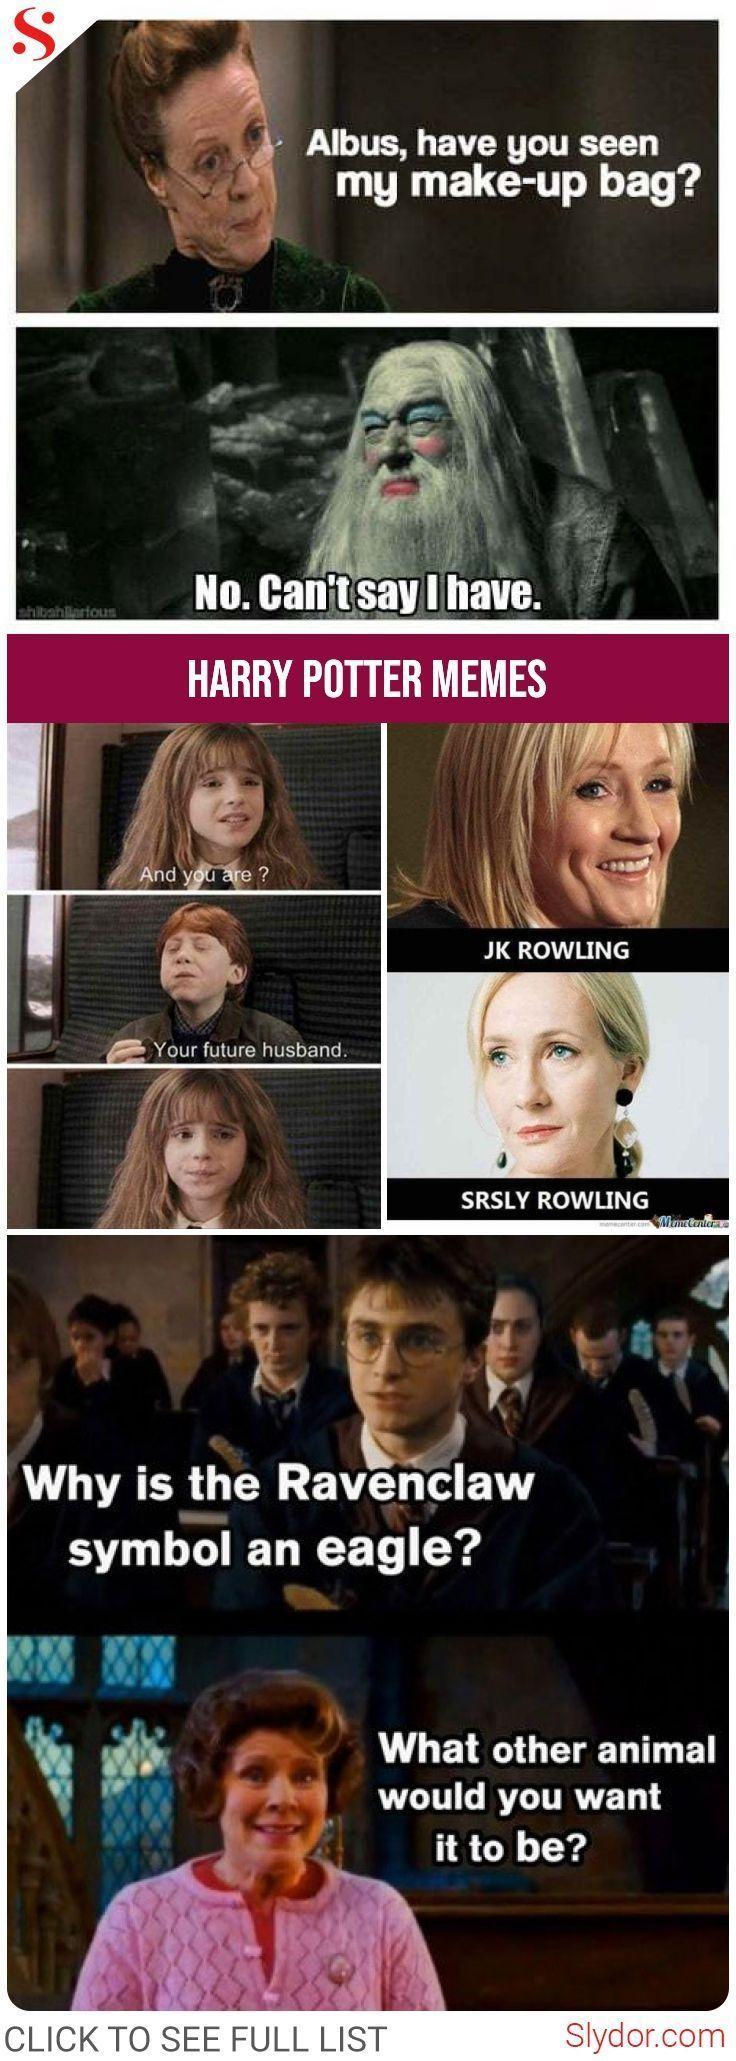 Harry Potter Memes A Only A True Potterhead Can Understand Part 2 Harrypotter Harrypot Harry Potter Memes Harry Potter Memes Hilarious Harry Potter Facts